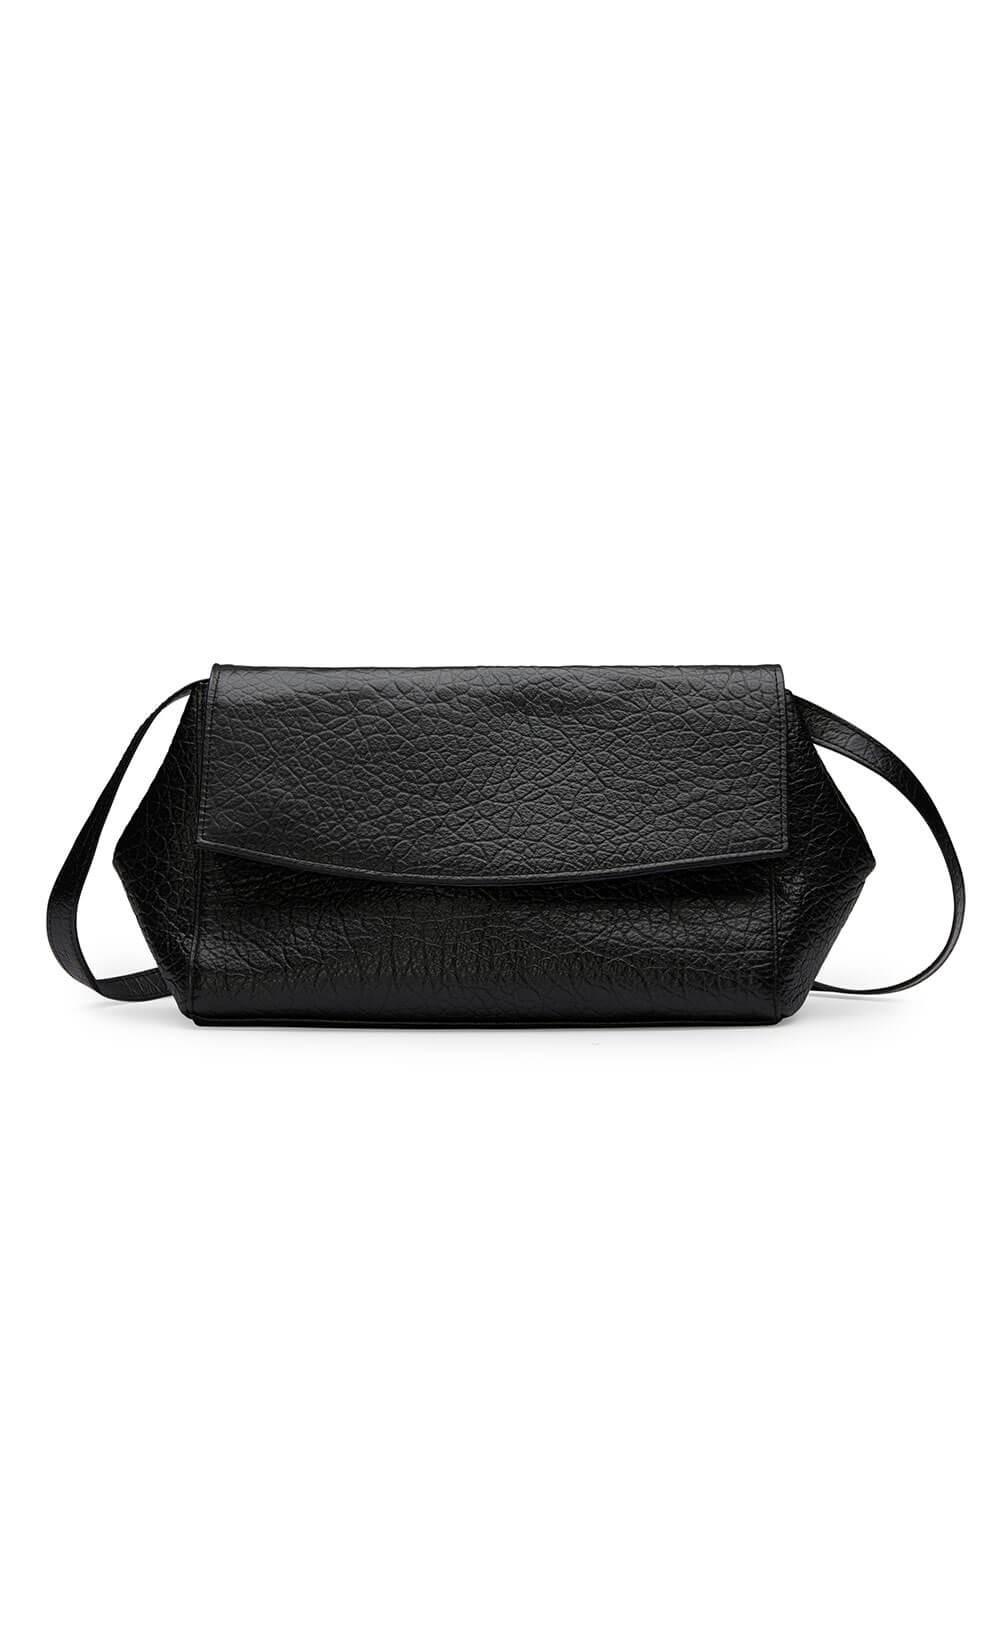 Isadora Bag